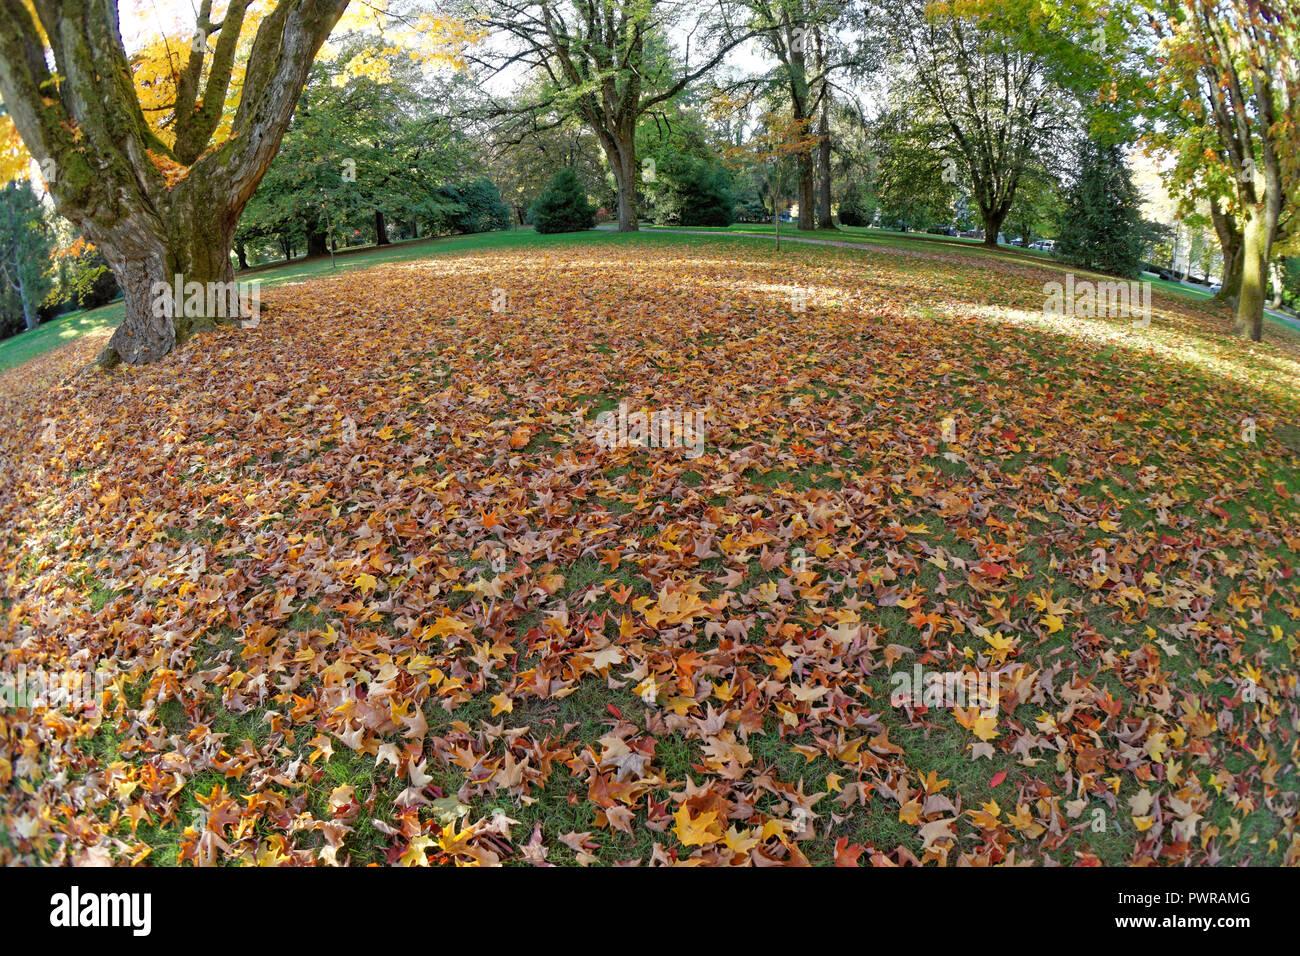 fisheye-view-of-colorful-fall-maple-leav